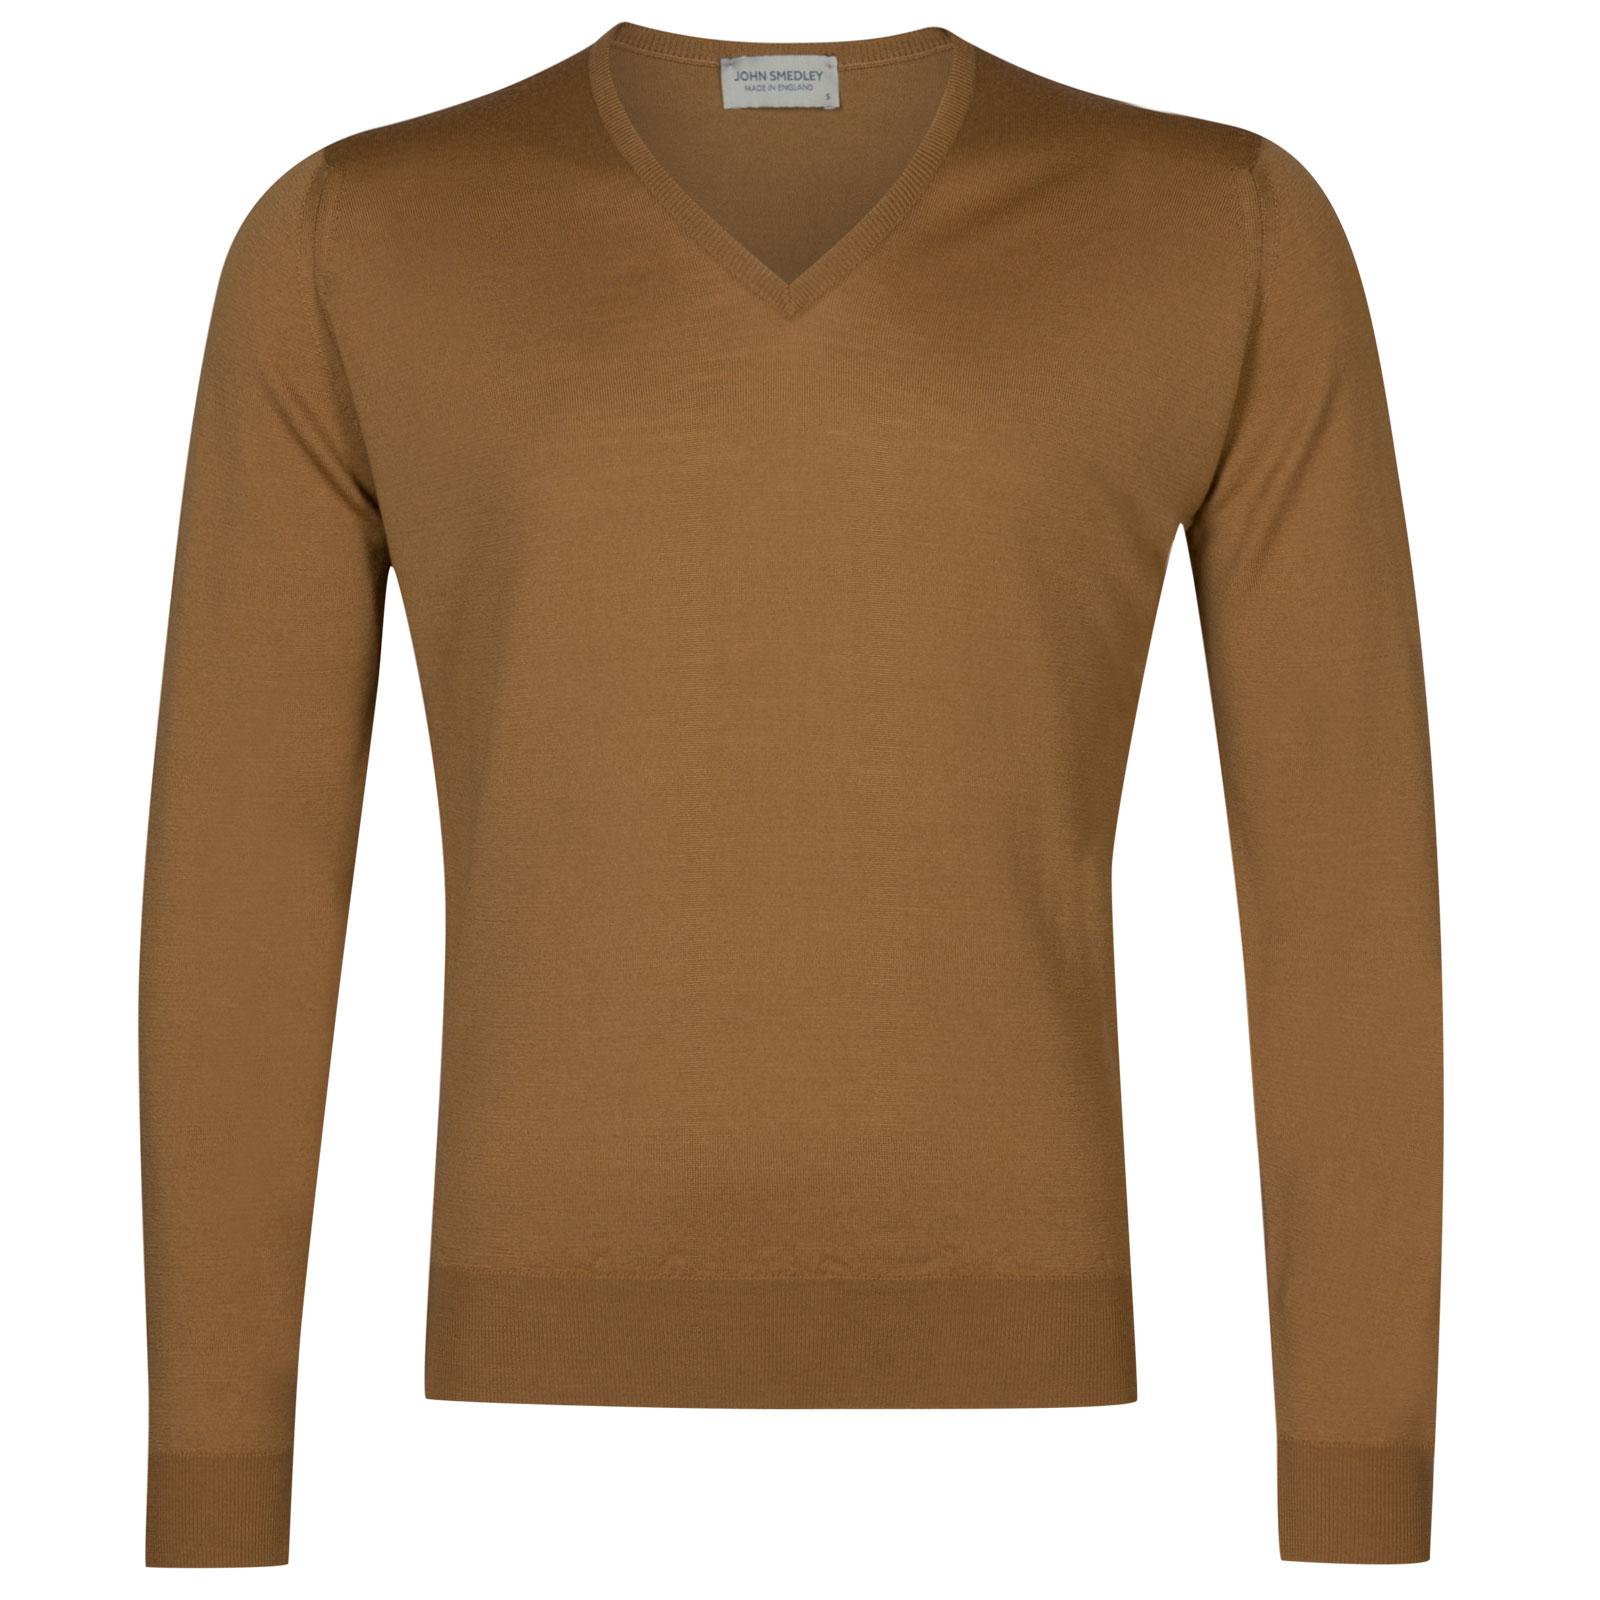 John Smedley Lugano Merino Wool Pullover in Camel-XXL